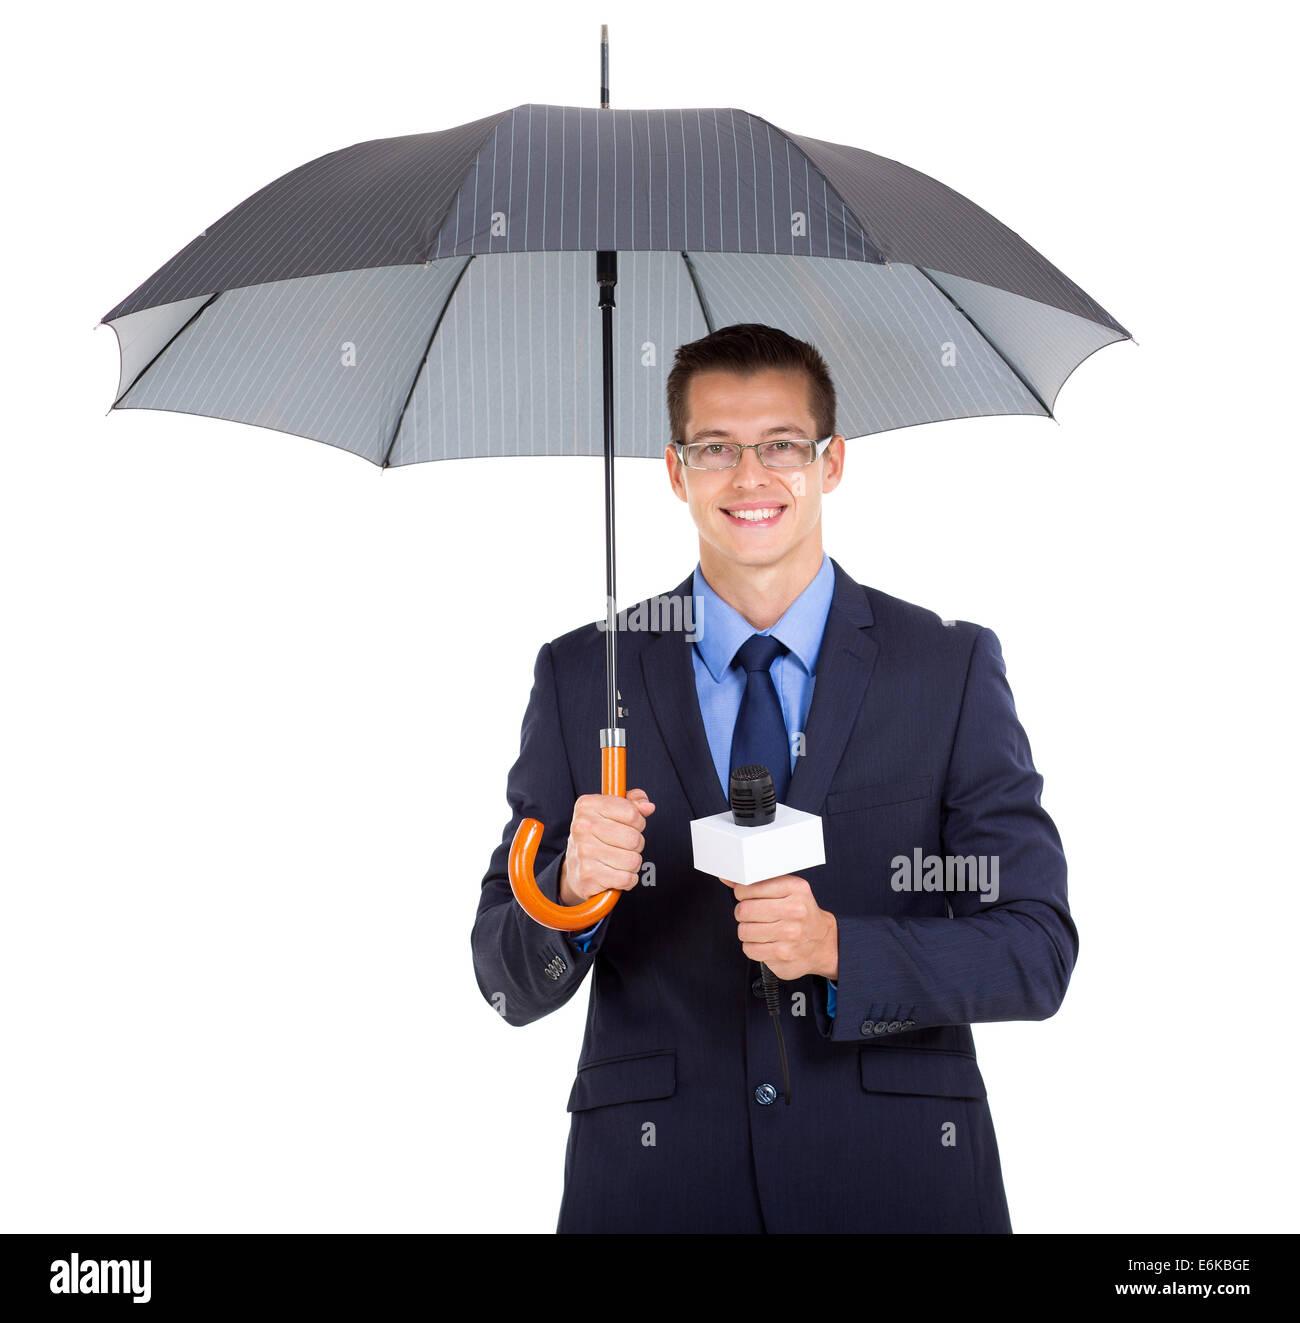 handsome news journalist holding umbrella over white background - Stock Image